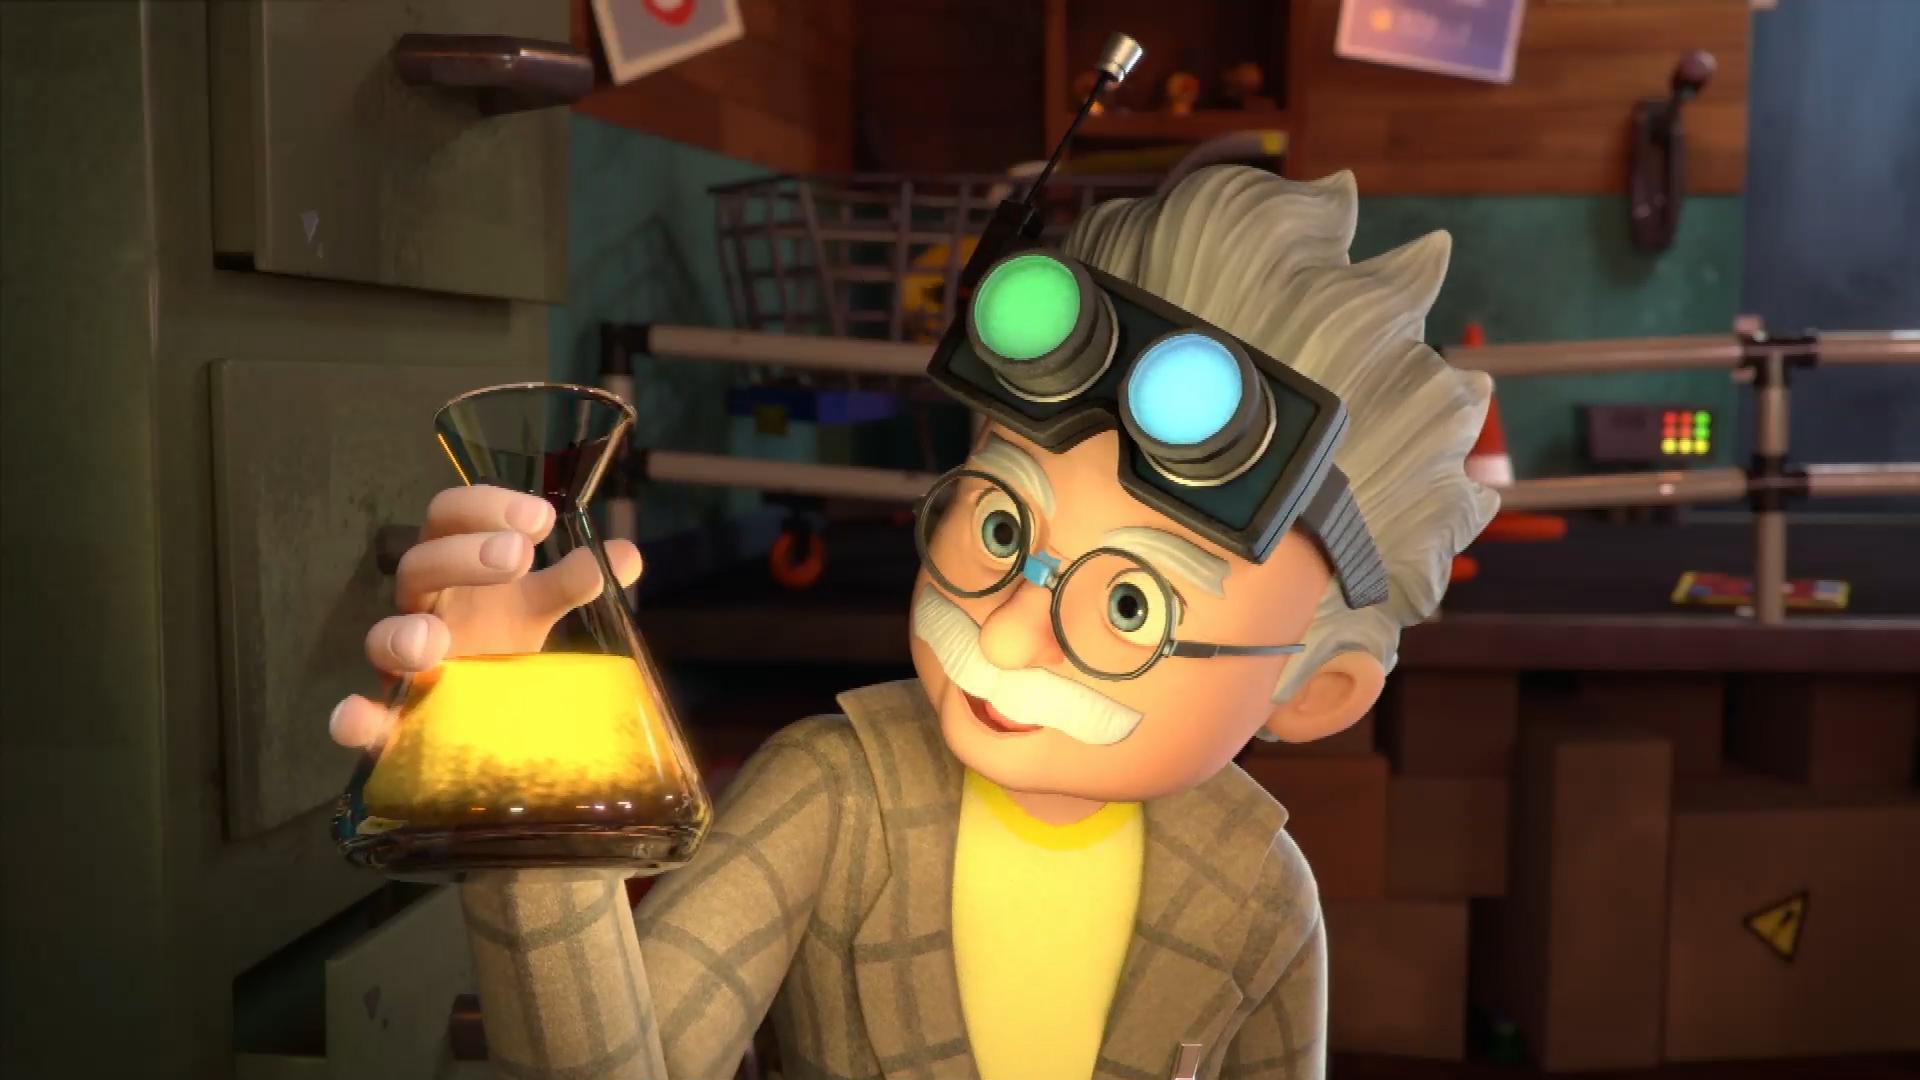 Professor Von Screwtop